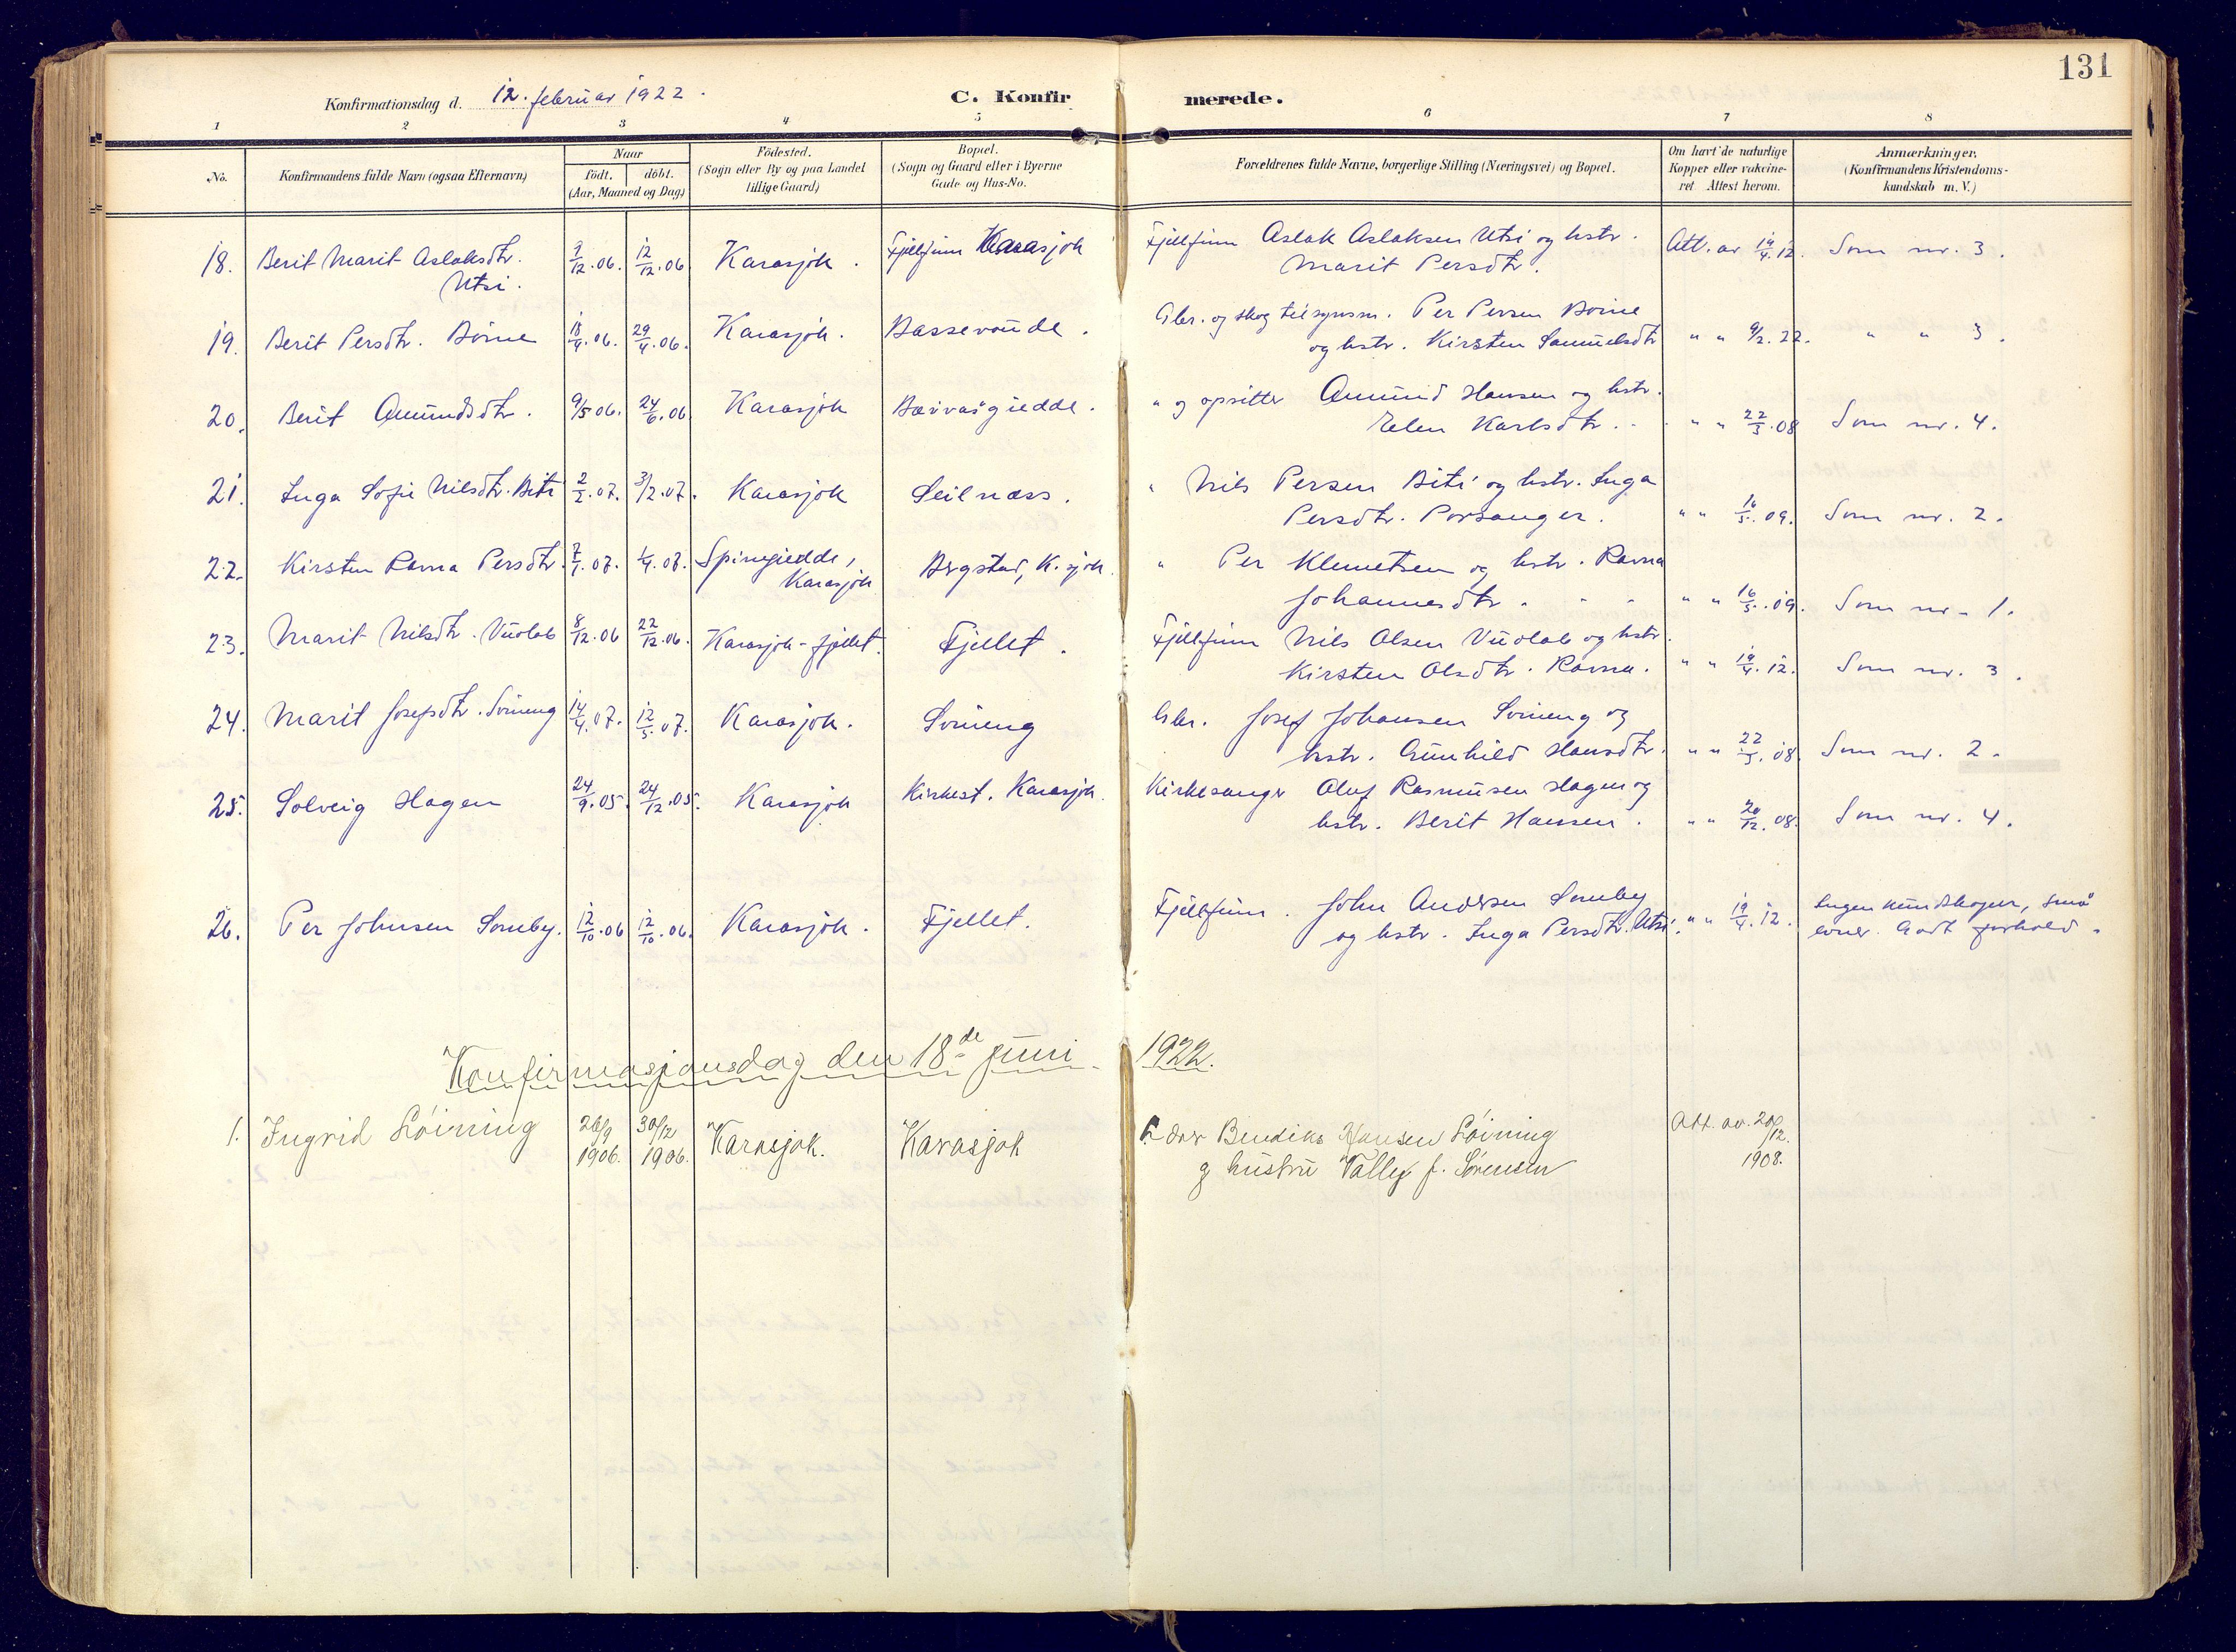 SATØ, Karasjok sokneprestkontor, H/Ha: Ministerialbok nr. 3, 1907-1926, s. 131